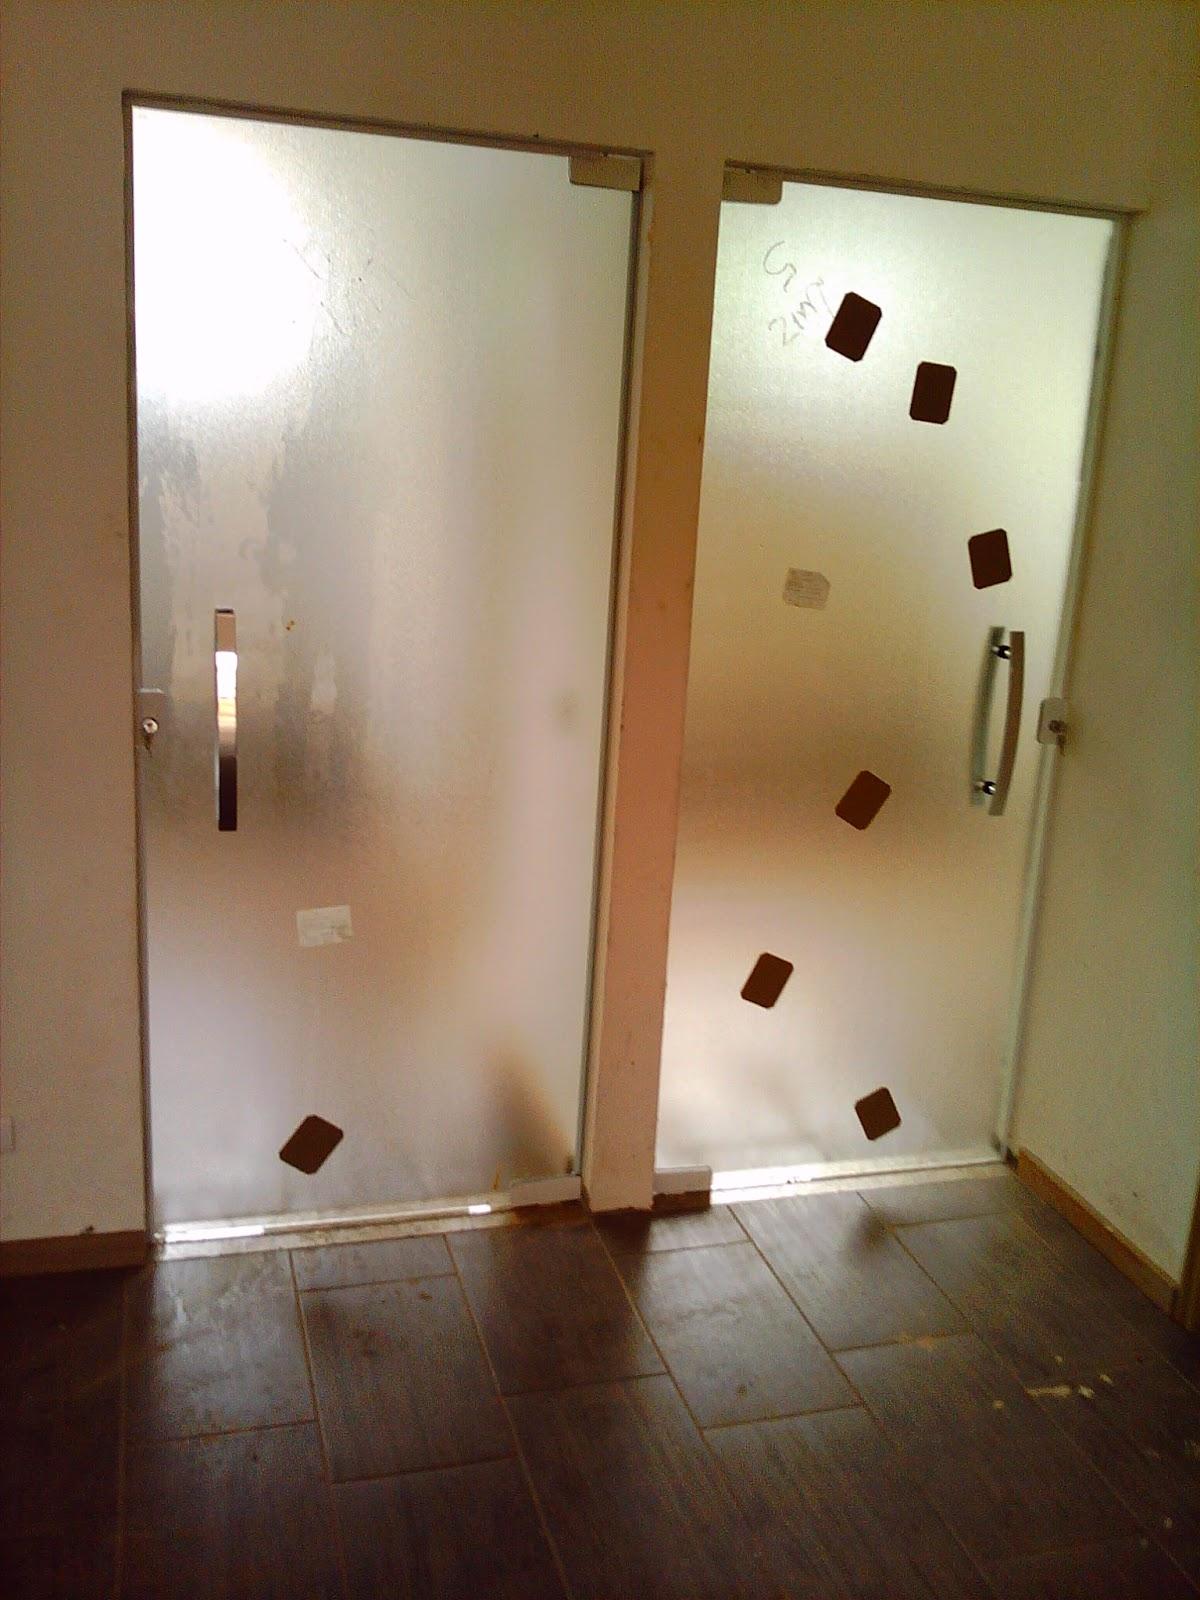 #684D2A FRANCO VIDROS TEMPERADOS: Dezembro 2012 184 Janelas De Vidro Na Potiguar